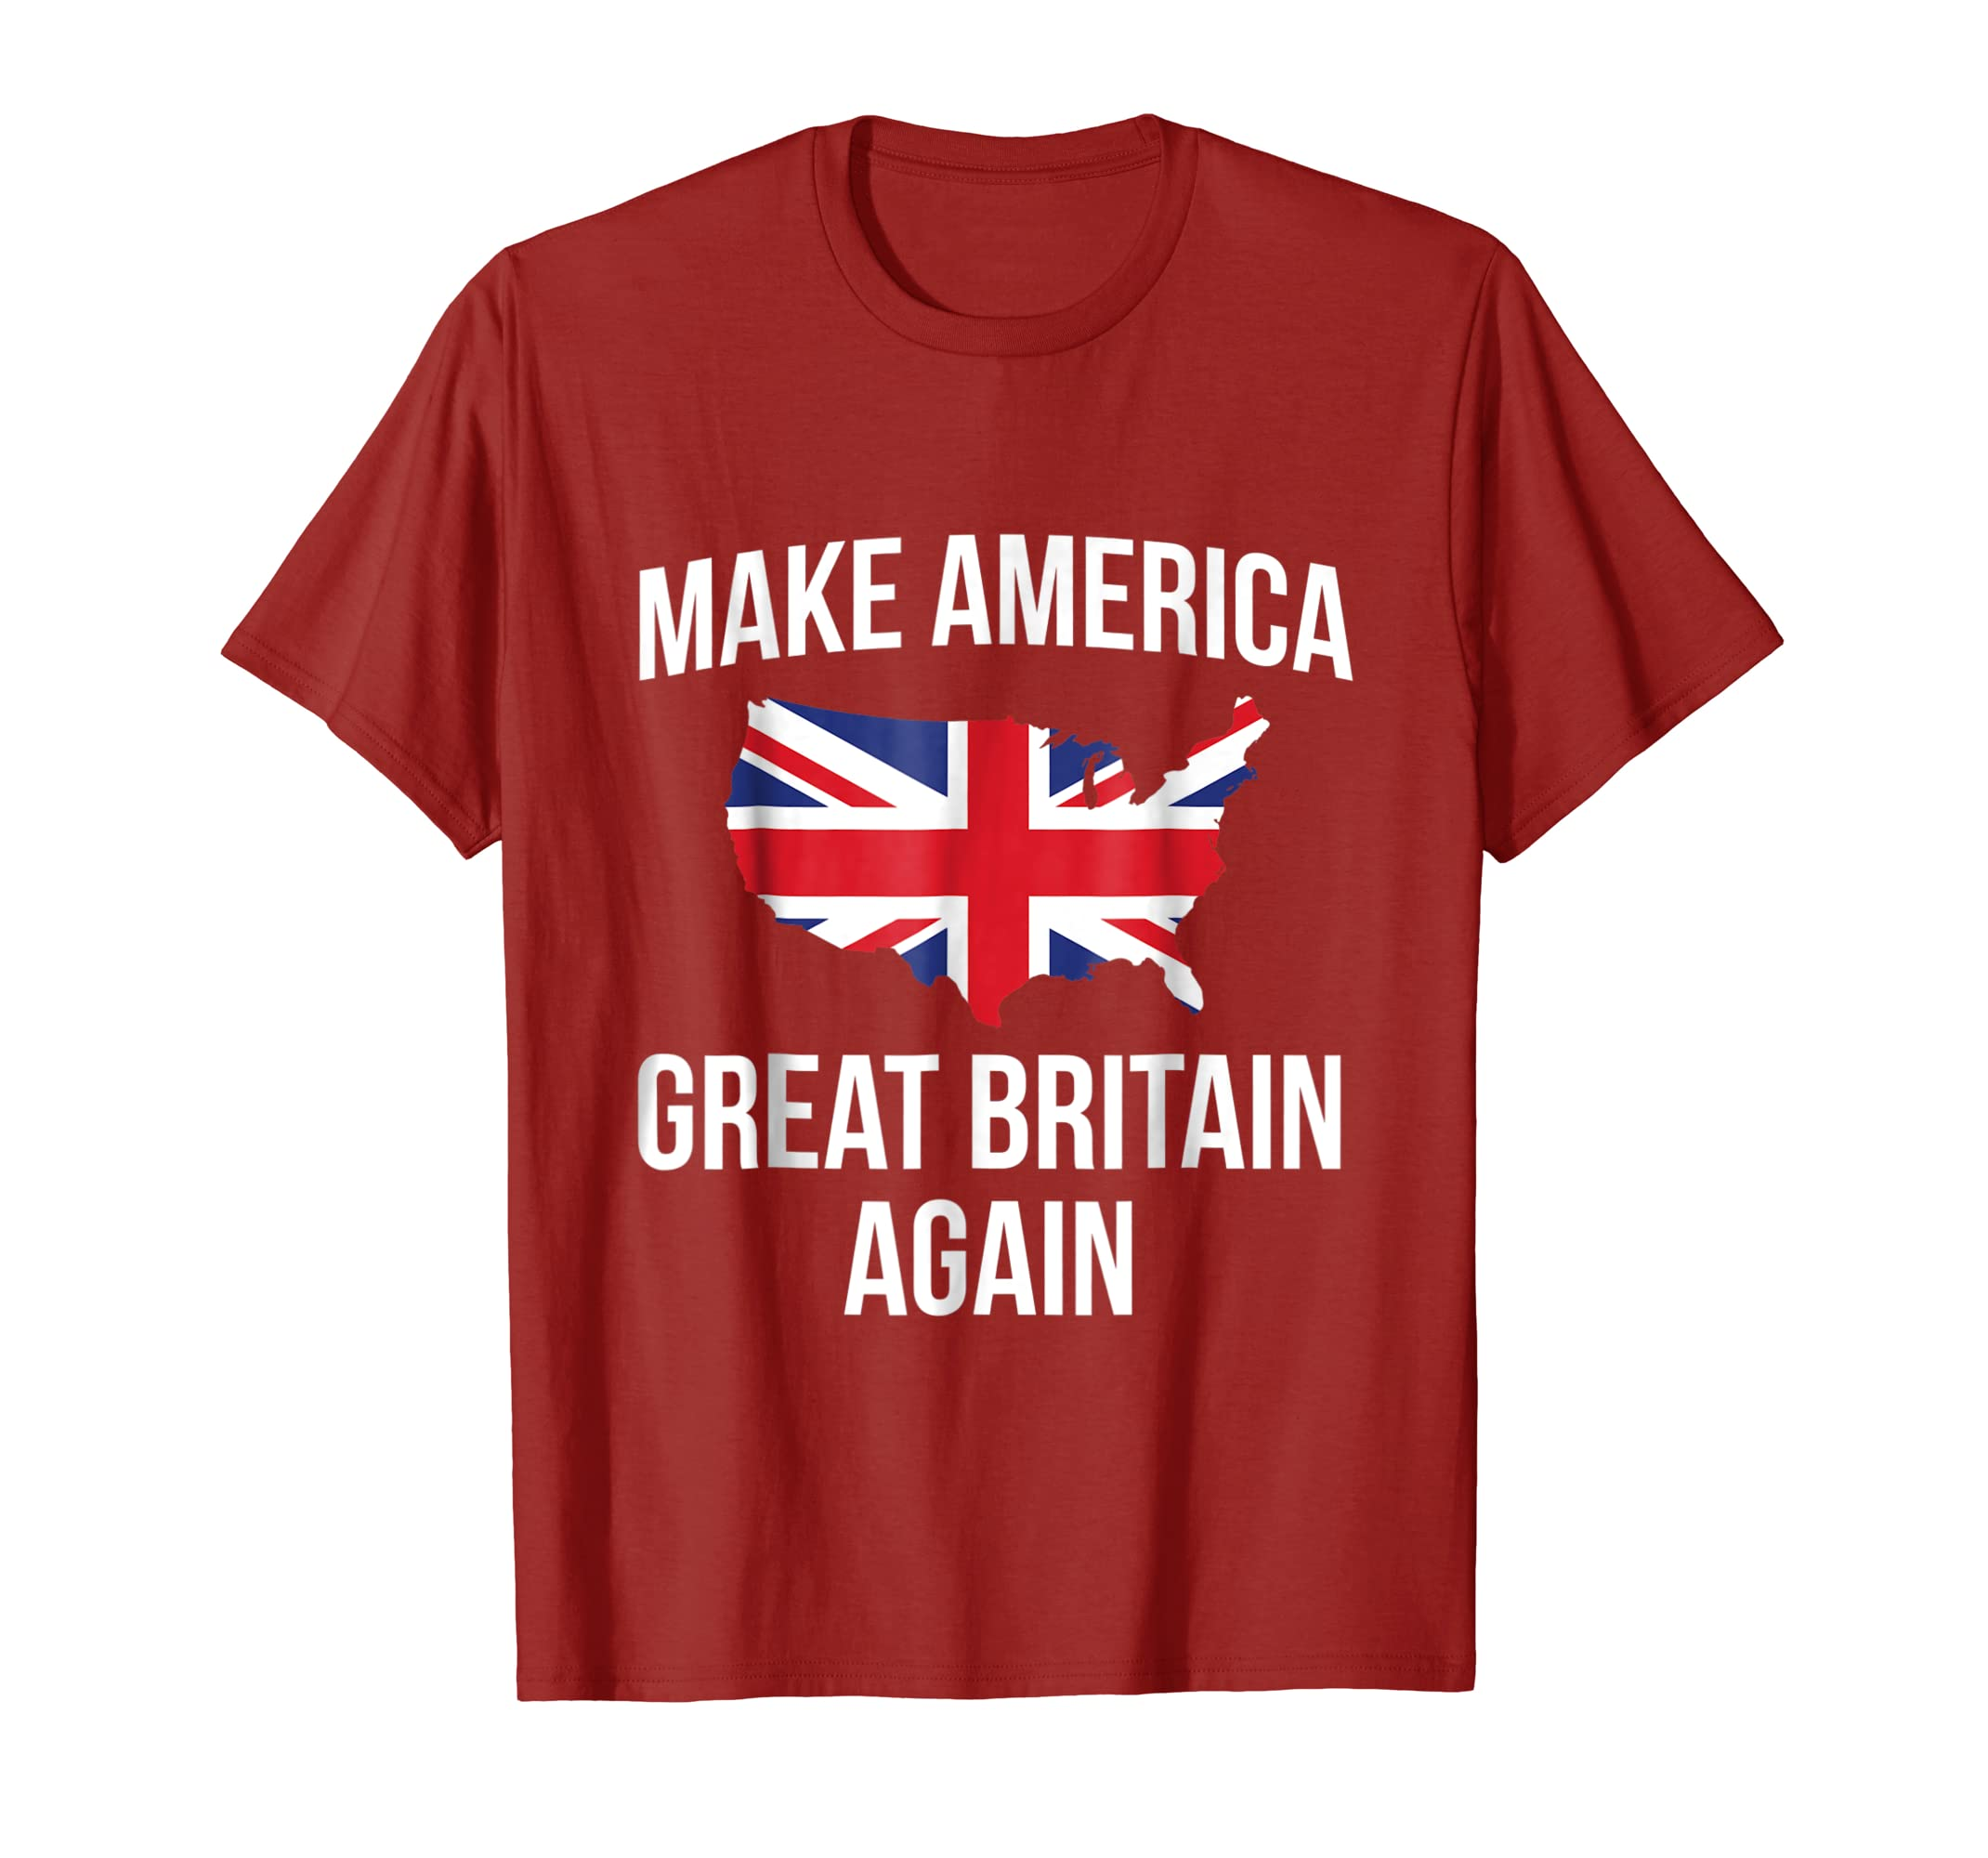 Funny Make America Great Britain UK Flag Tshirt – For Brits-Yolotee